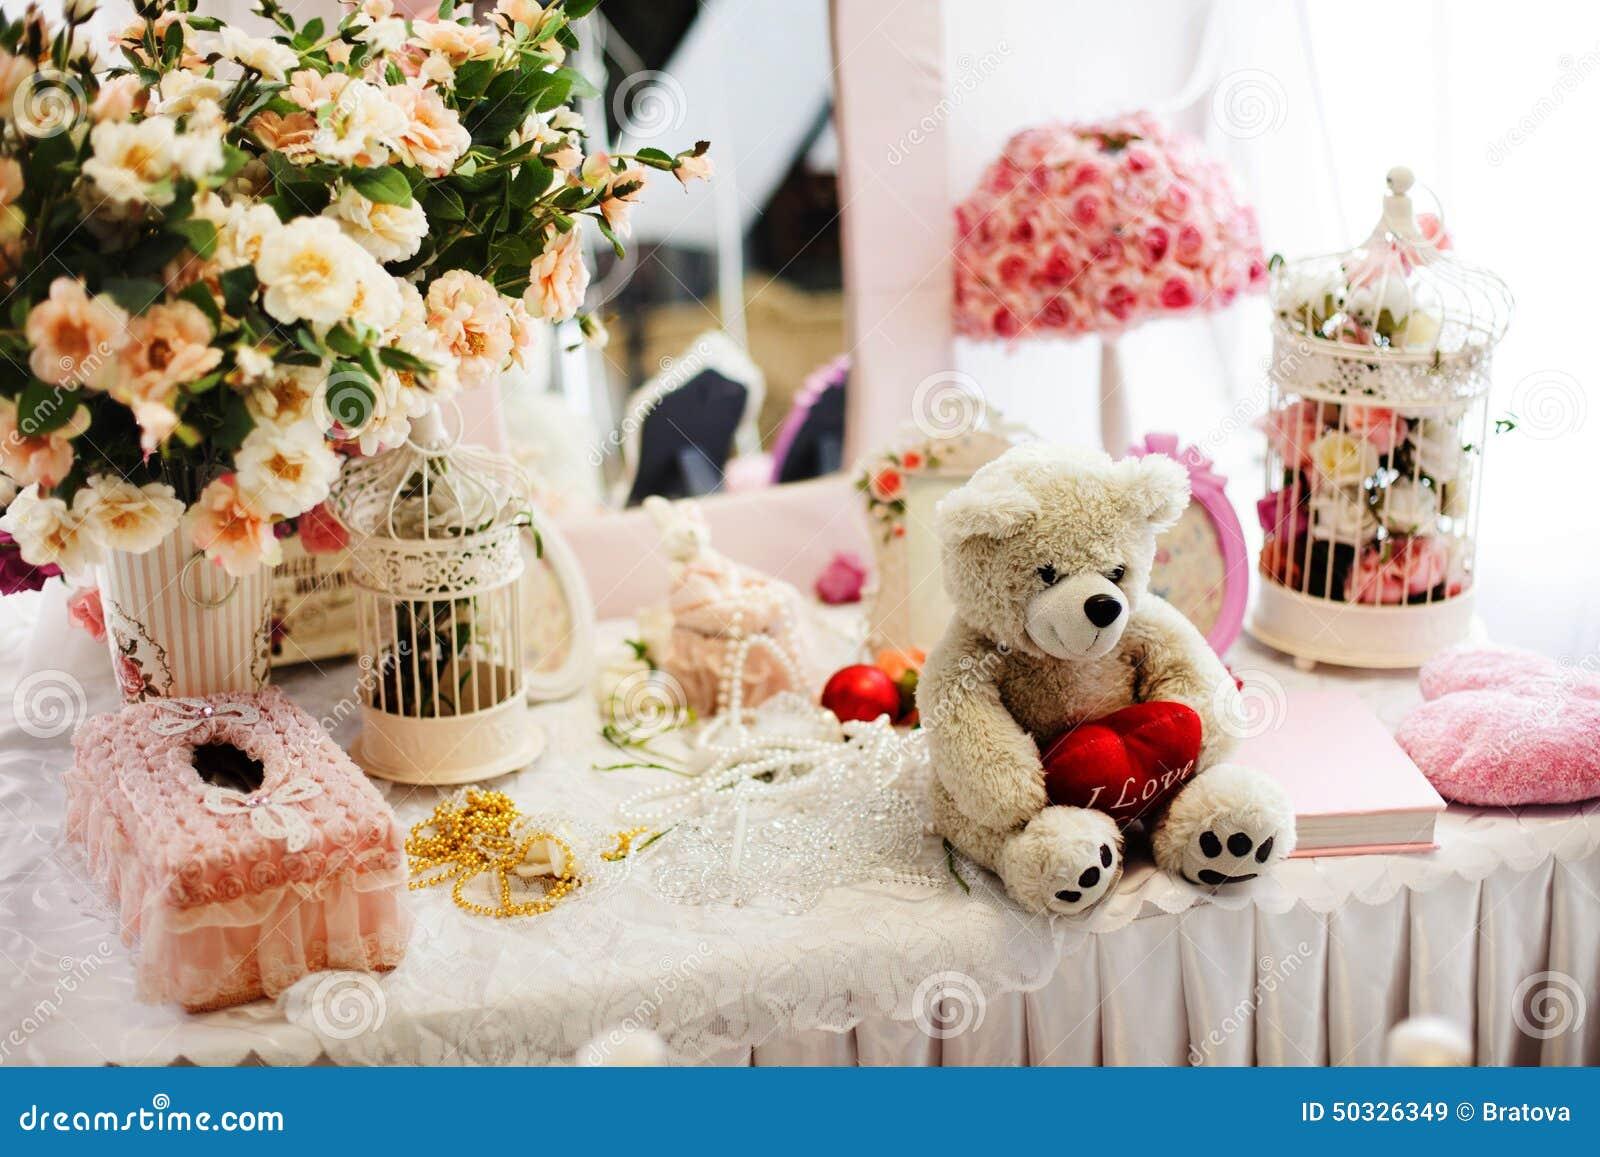 Cute teddy bear with a heart in pink still life stock image image cute teddy bear with a heart in pink still life izmirmasajfo